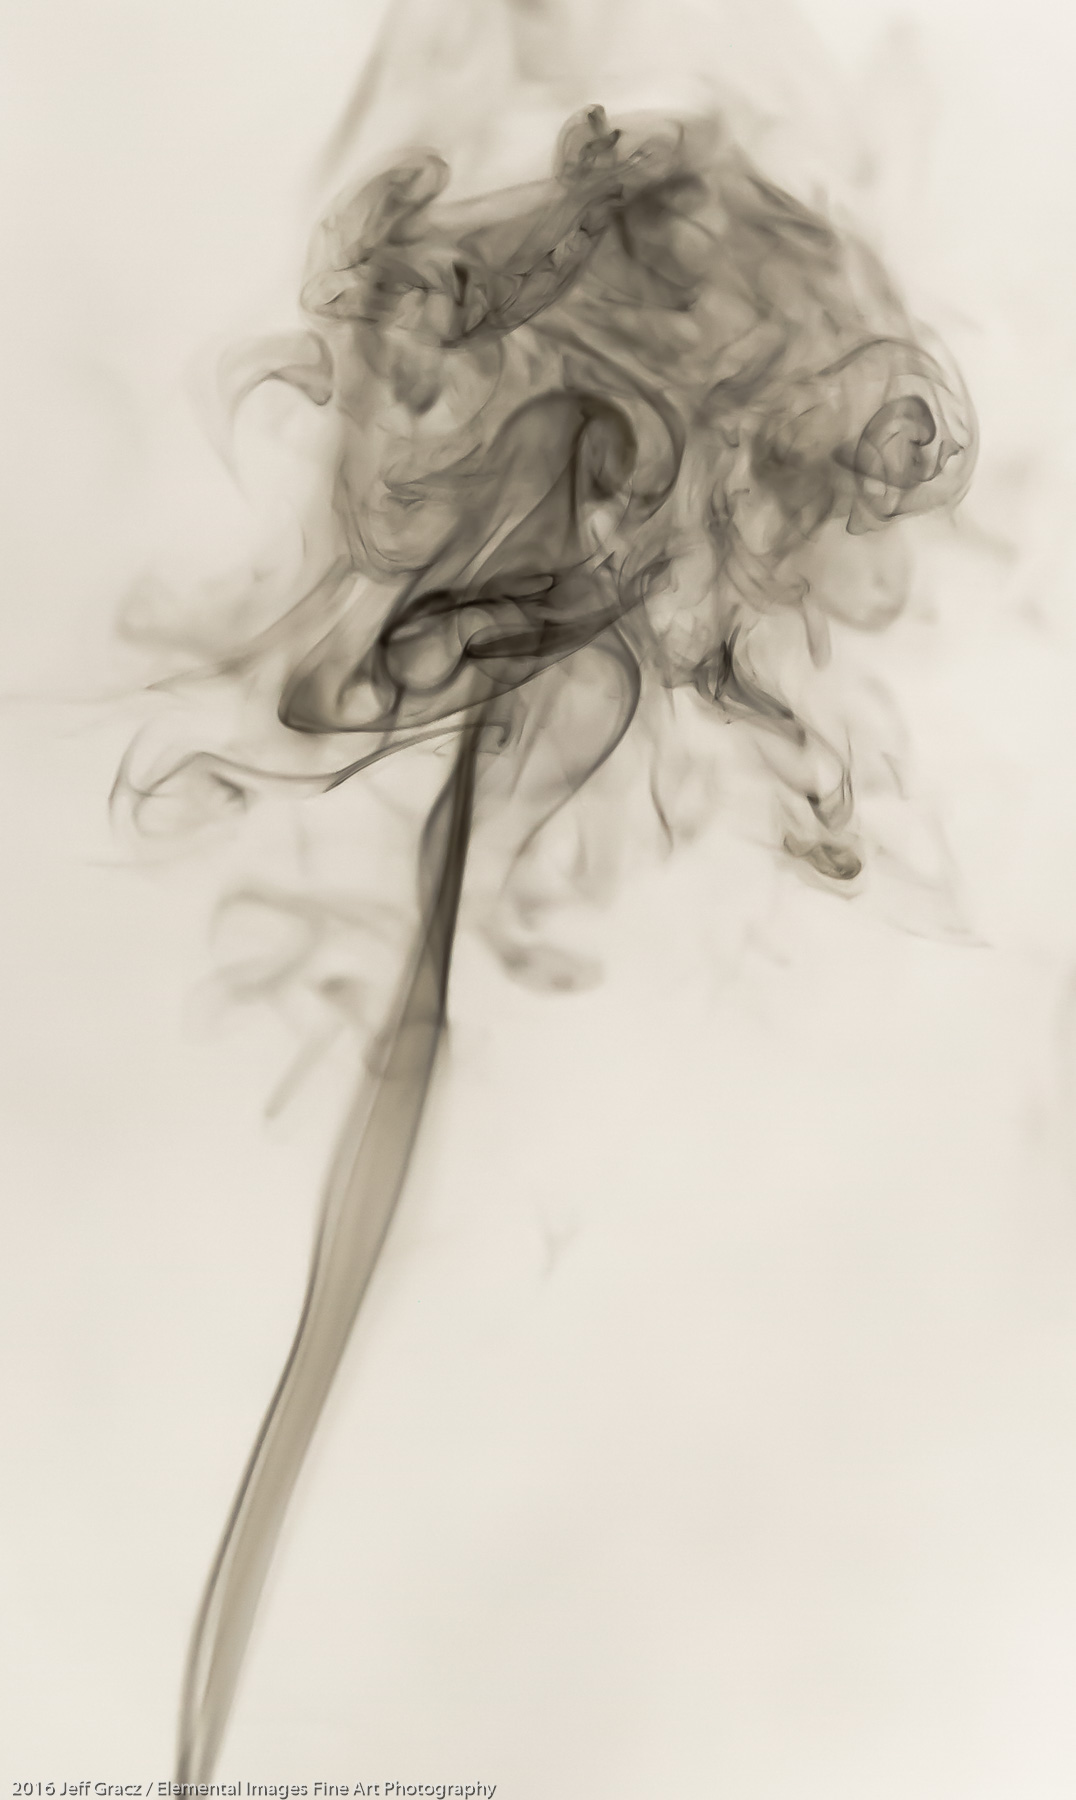 Smoke 25 | Vancouver | WA | USA - © 2016 Jeff Gracz / Elemental Images Fine Art Photography - All Rights Reserved Worldwide